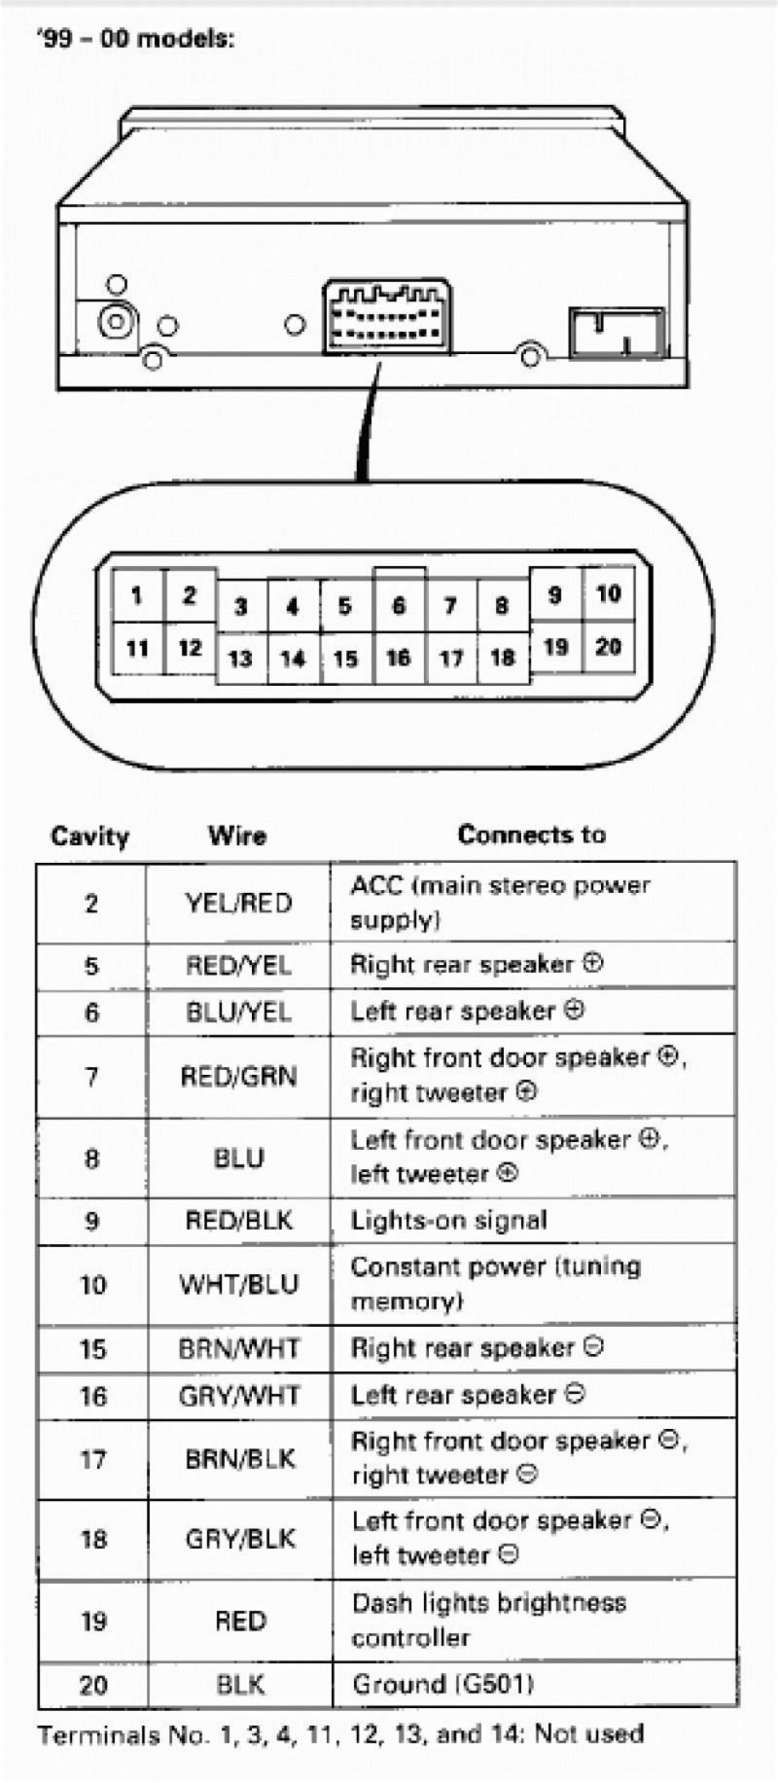 12 99 Honda Civic Engine Wiring Diagram Engine Diagram Wiringg Net In 2020 Honda Civic Car Civic Car Honda Civic